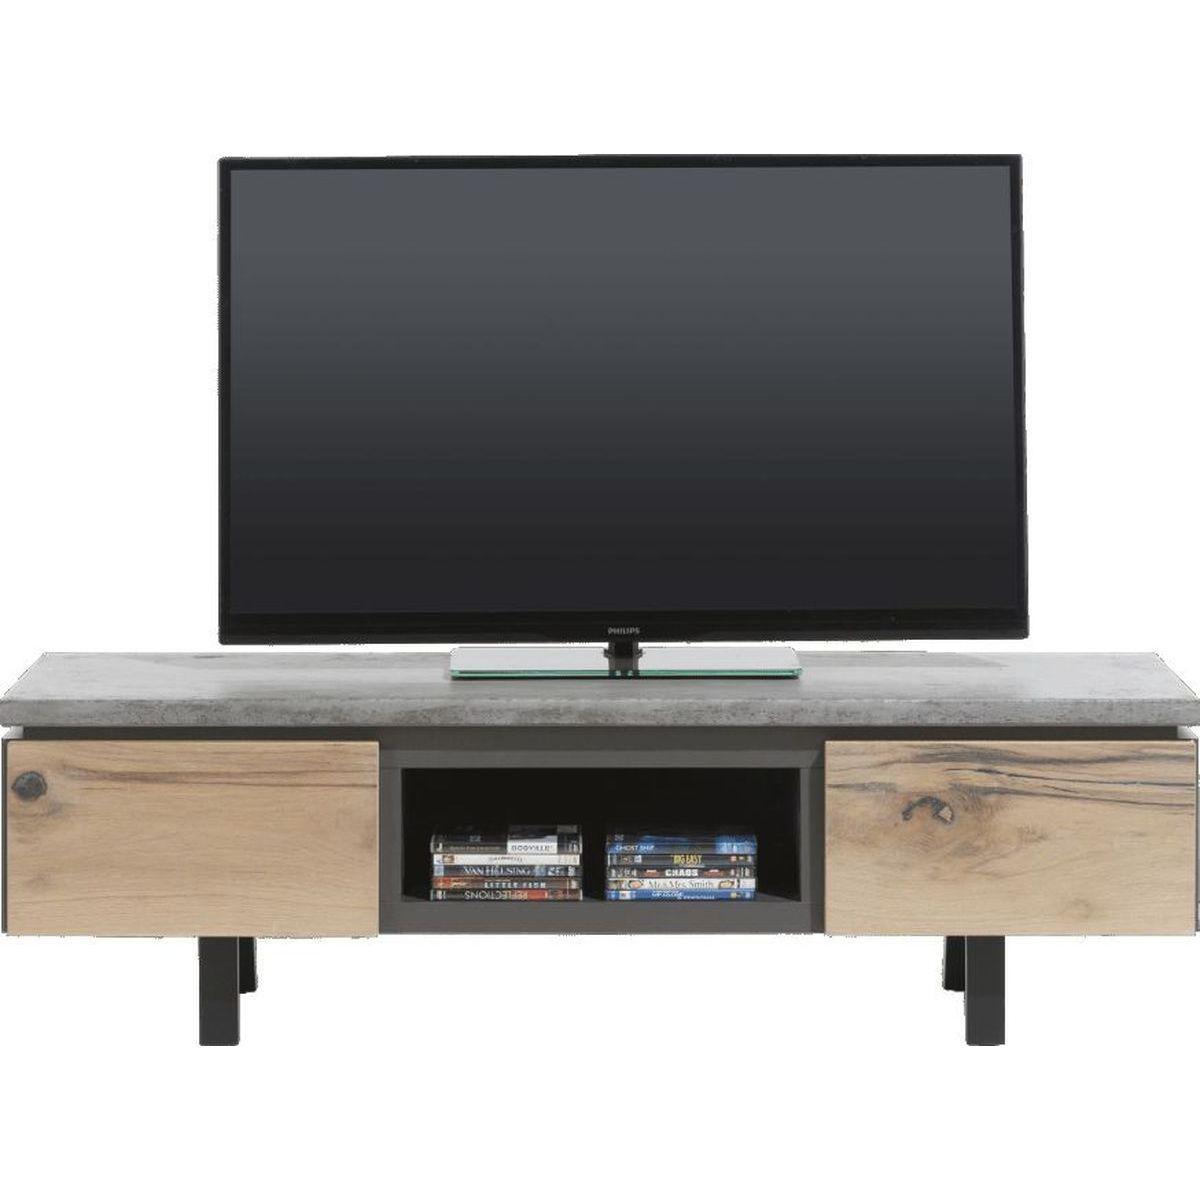 Meuble TV MYLAND Xooon 180cm béton